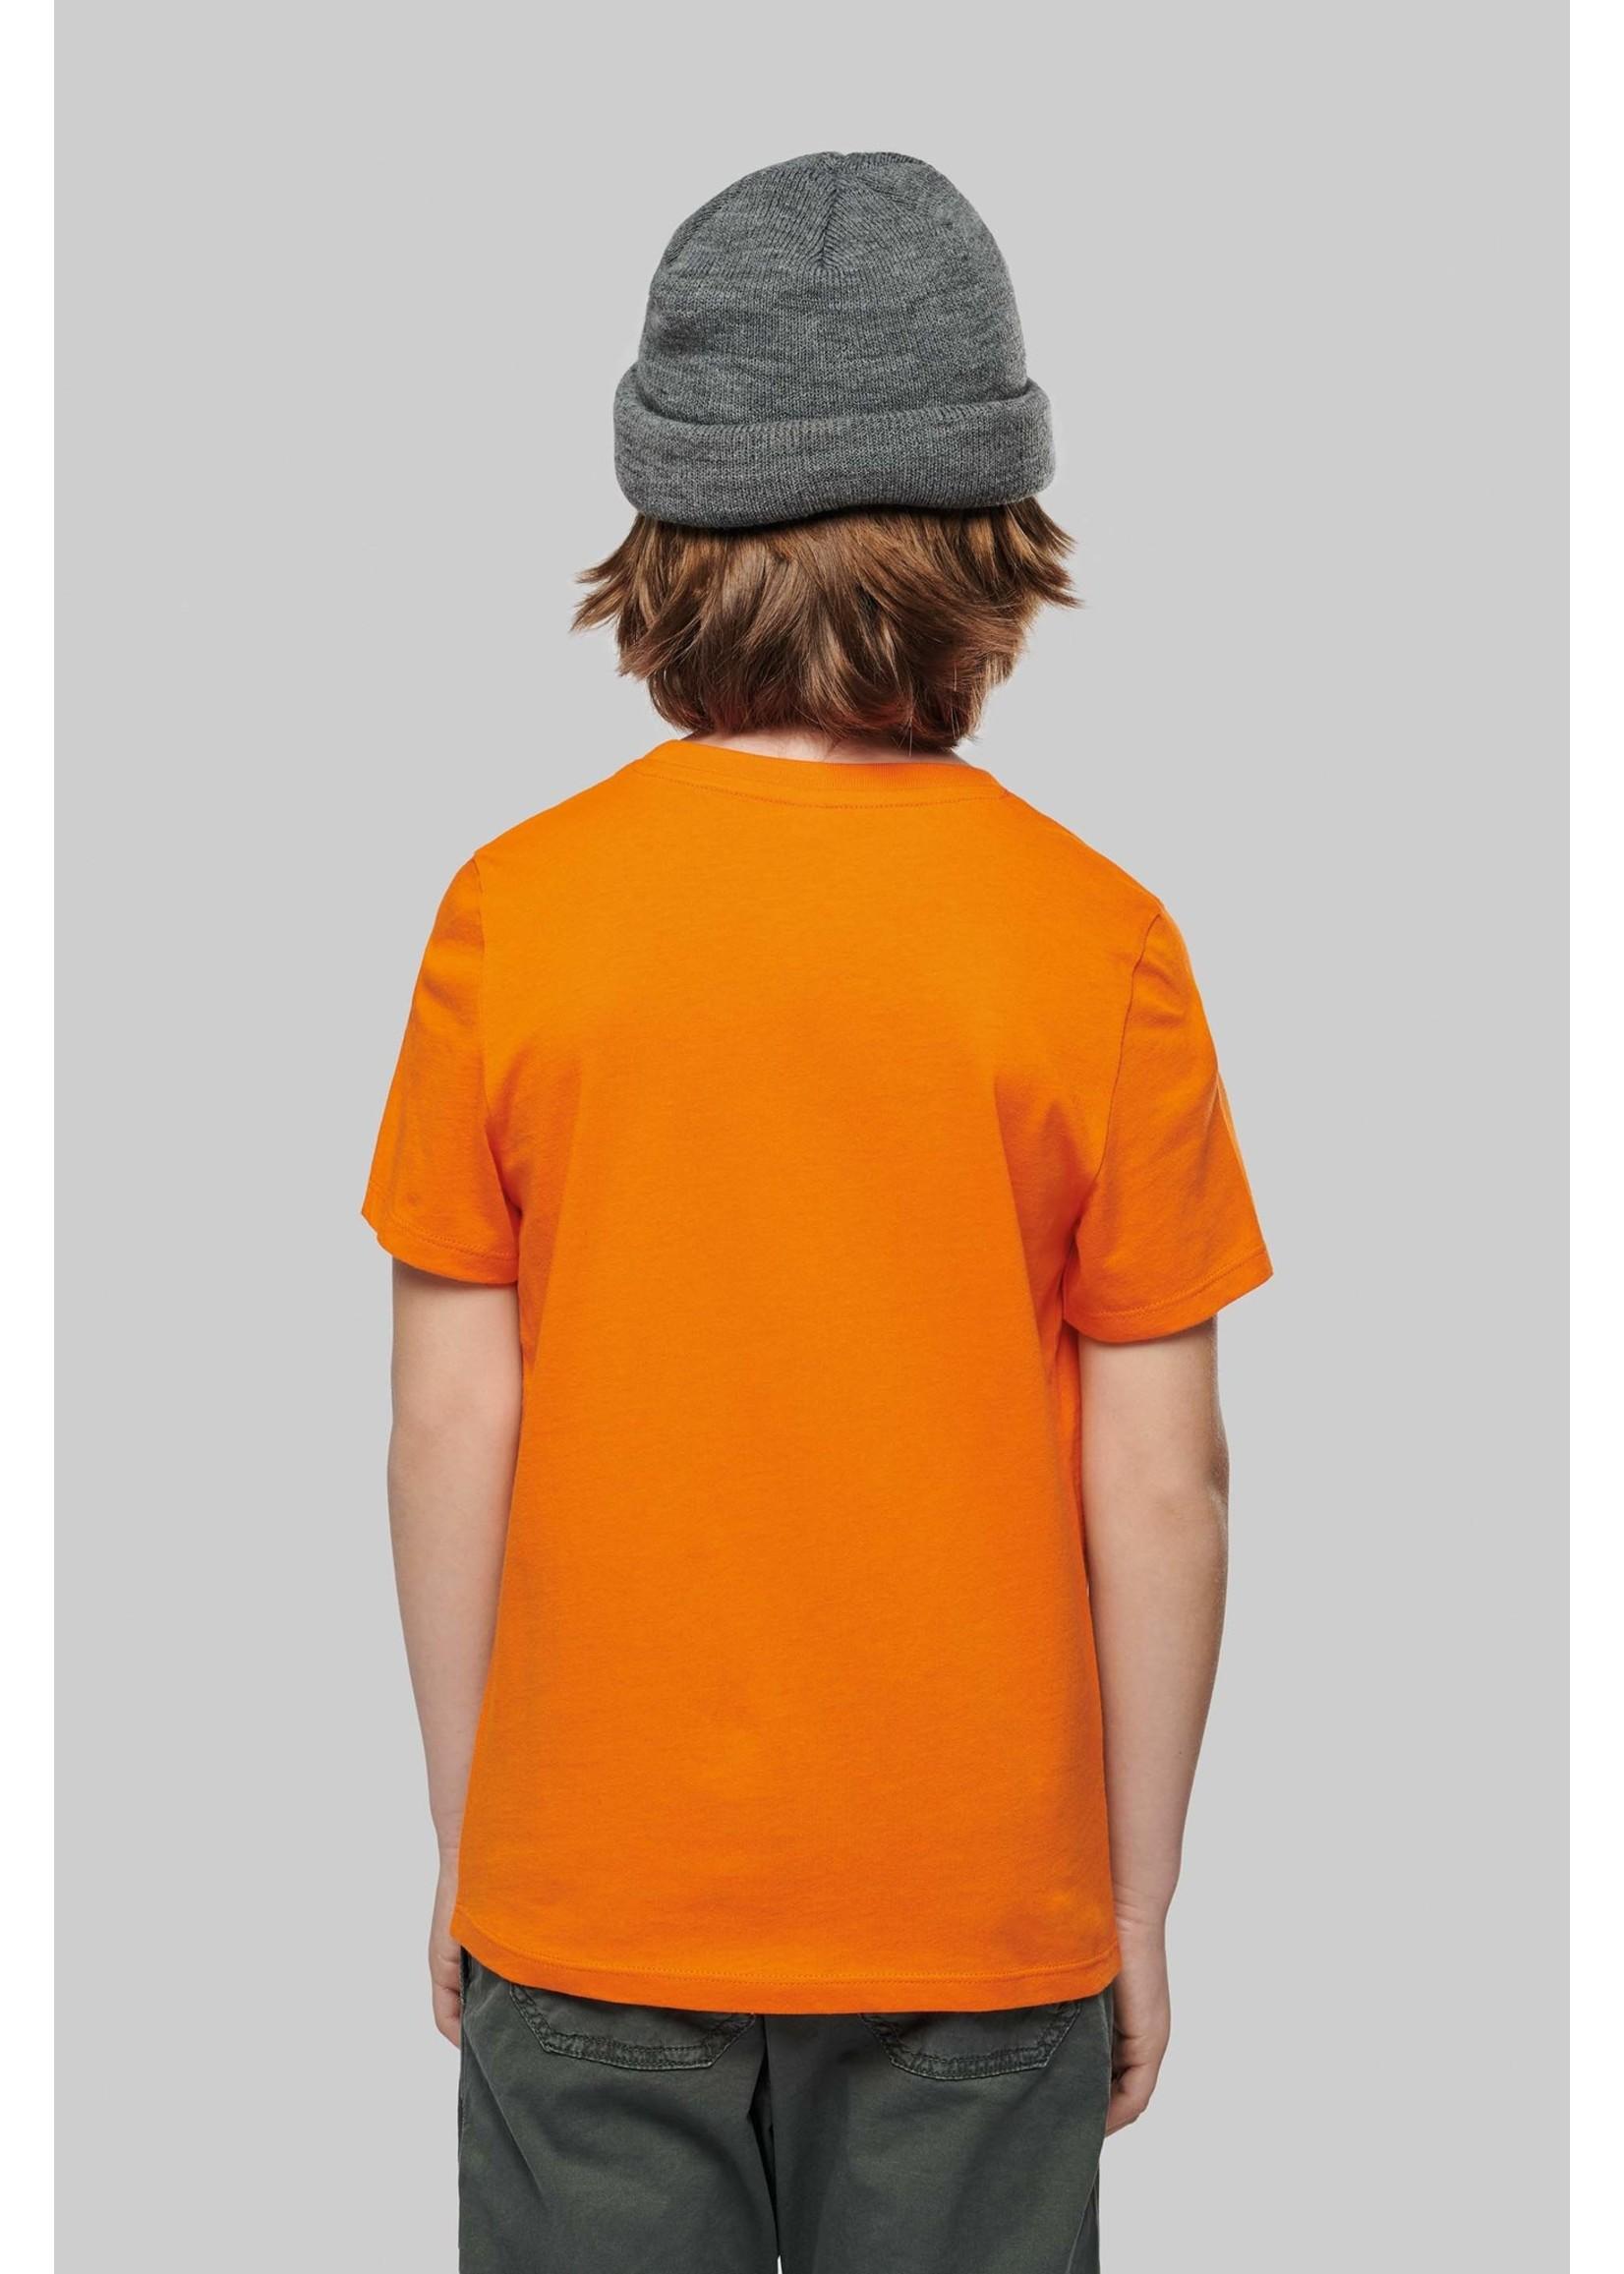 Eco-Friendly KIDS T-shirt - Wine